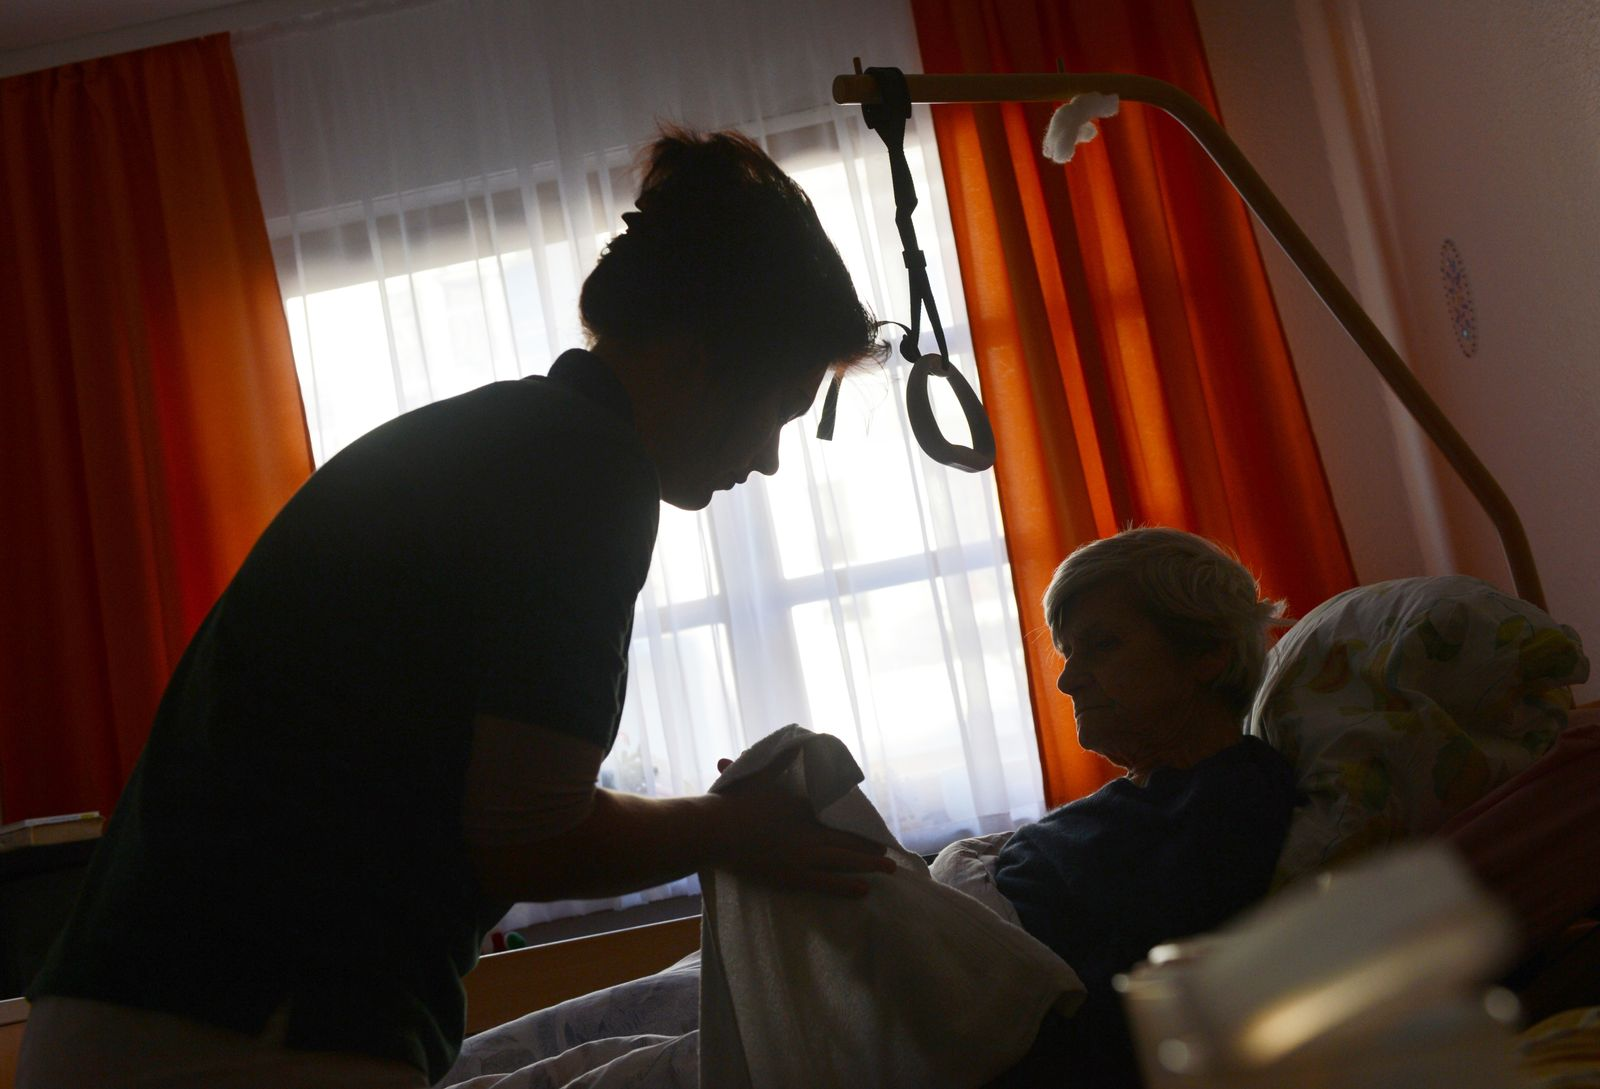 Altenpflege / Pflege / Pfleger / Krankenpflege